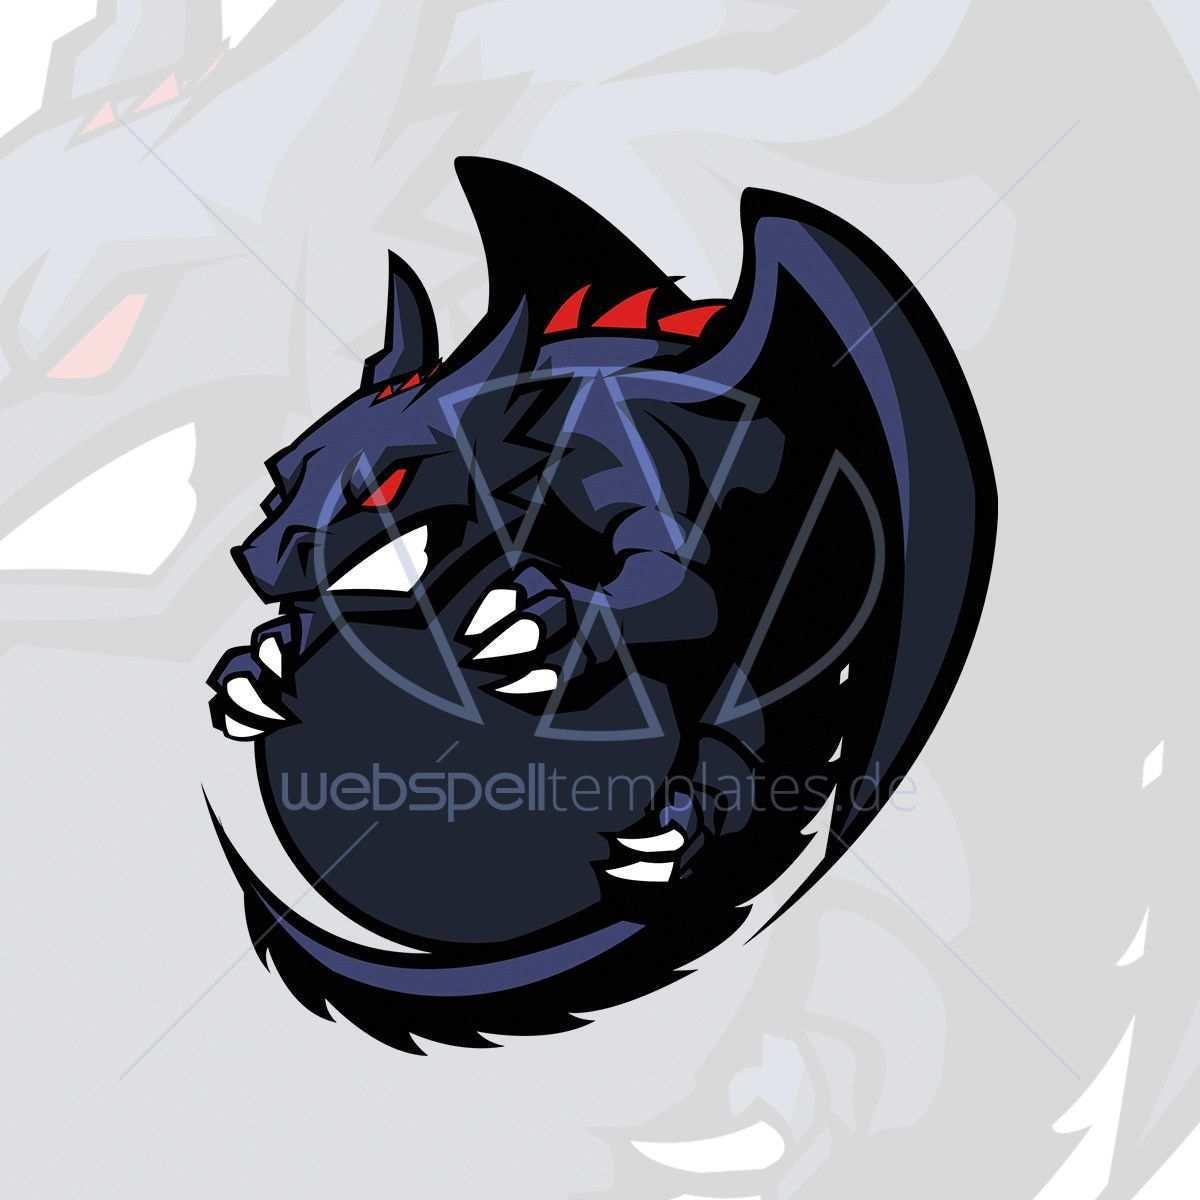 Webspelltemplates De Webspell Templatesvektor Drache Clan Logo Gaming Logo Maskottchen Maskottchen Drachen Logos